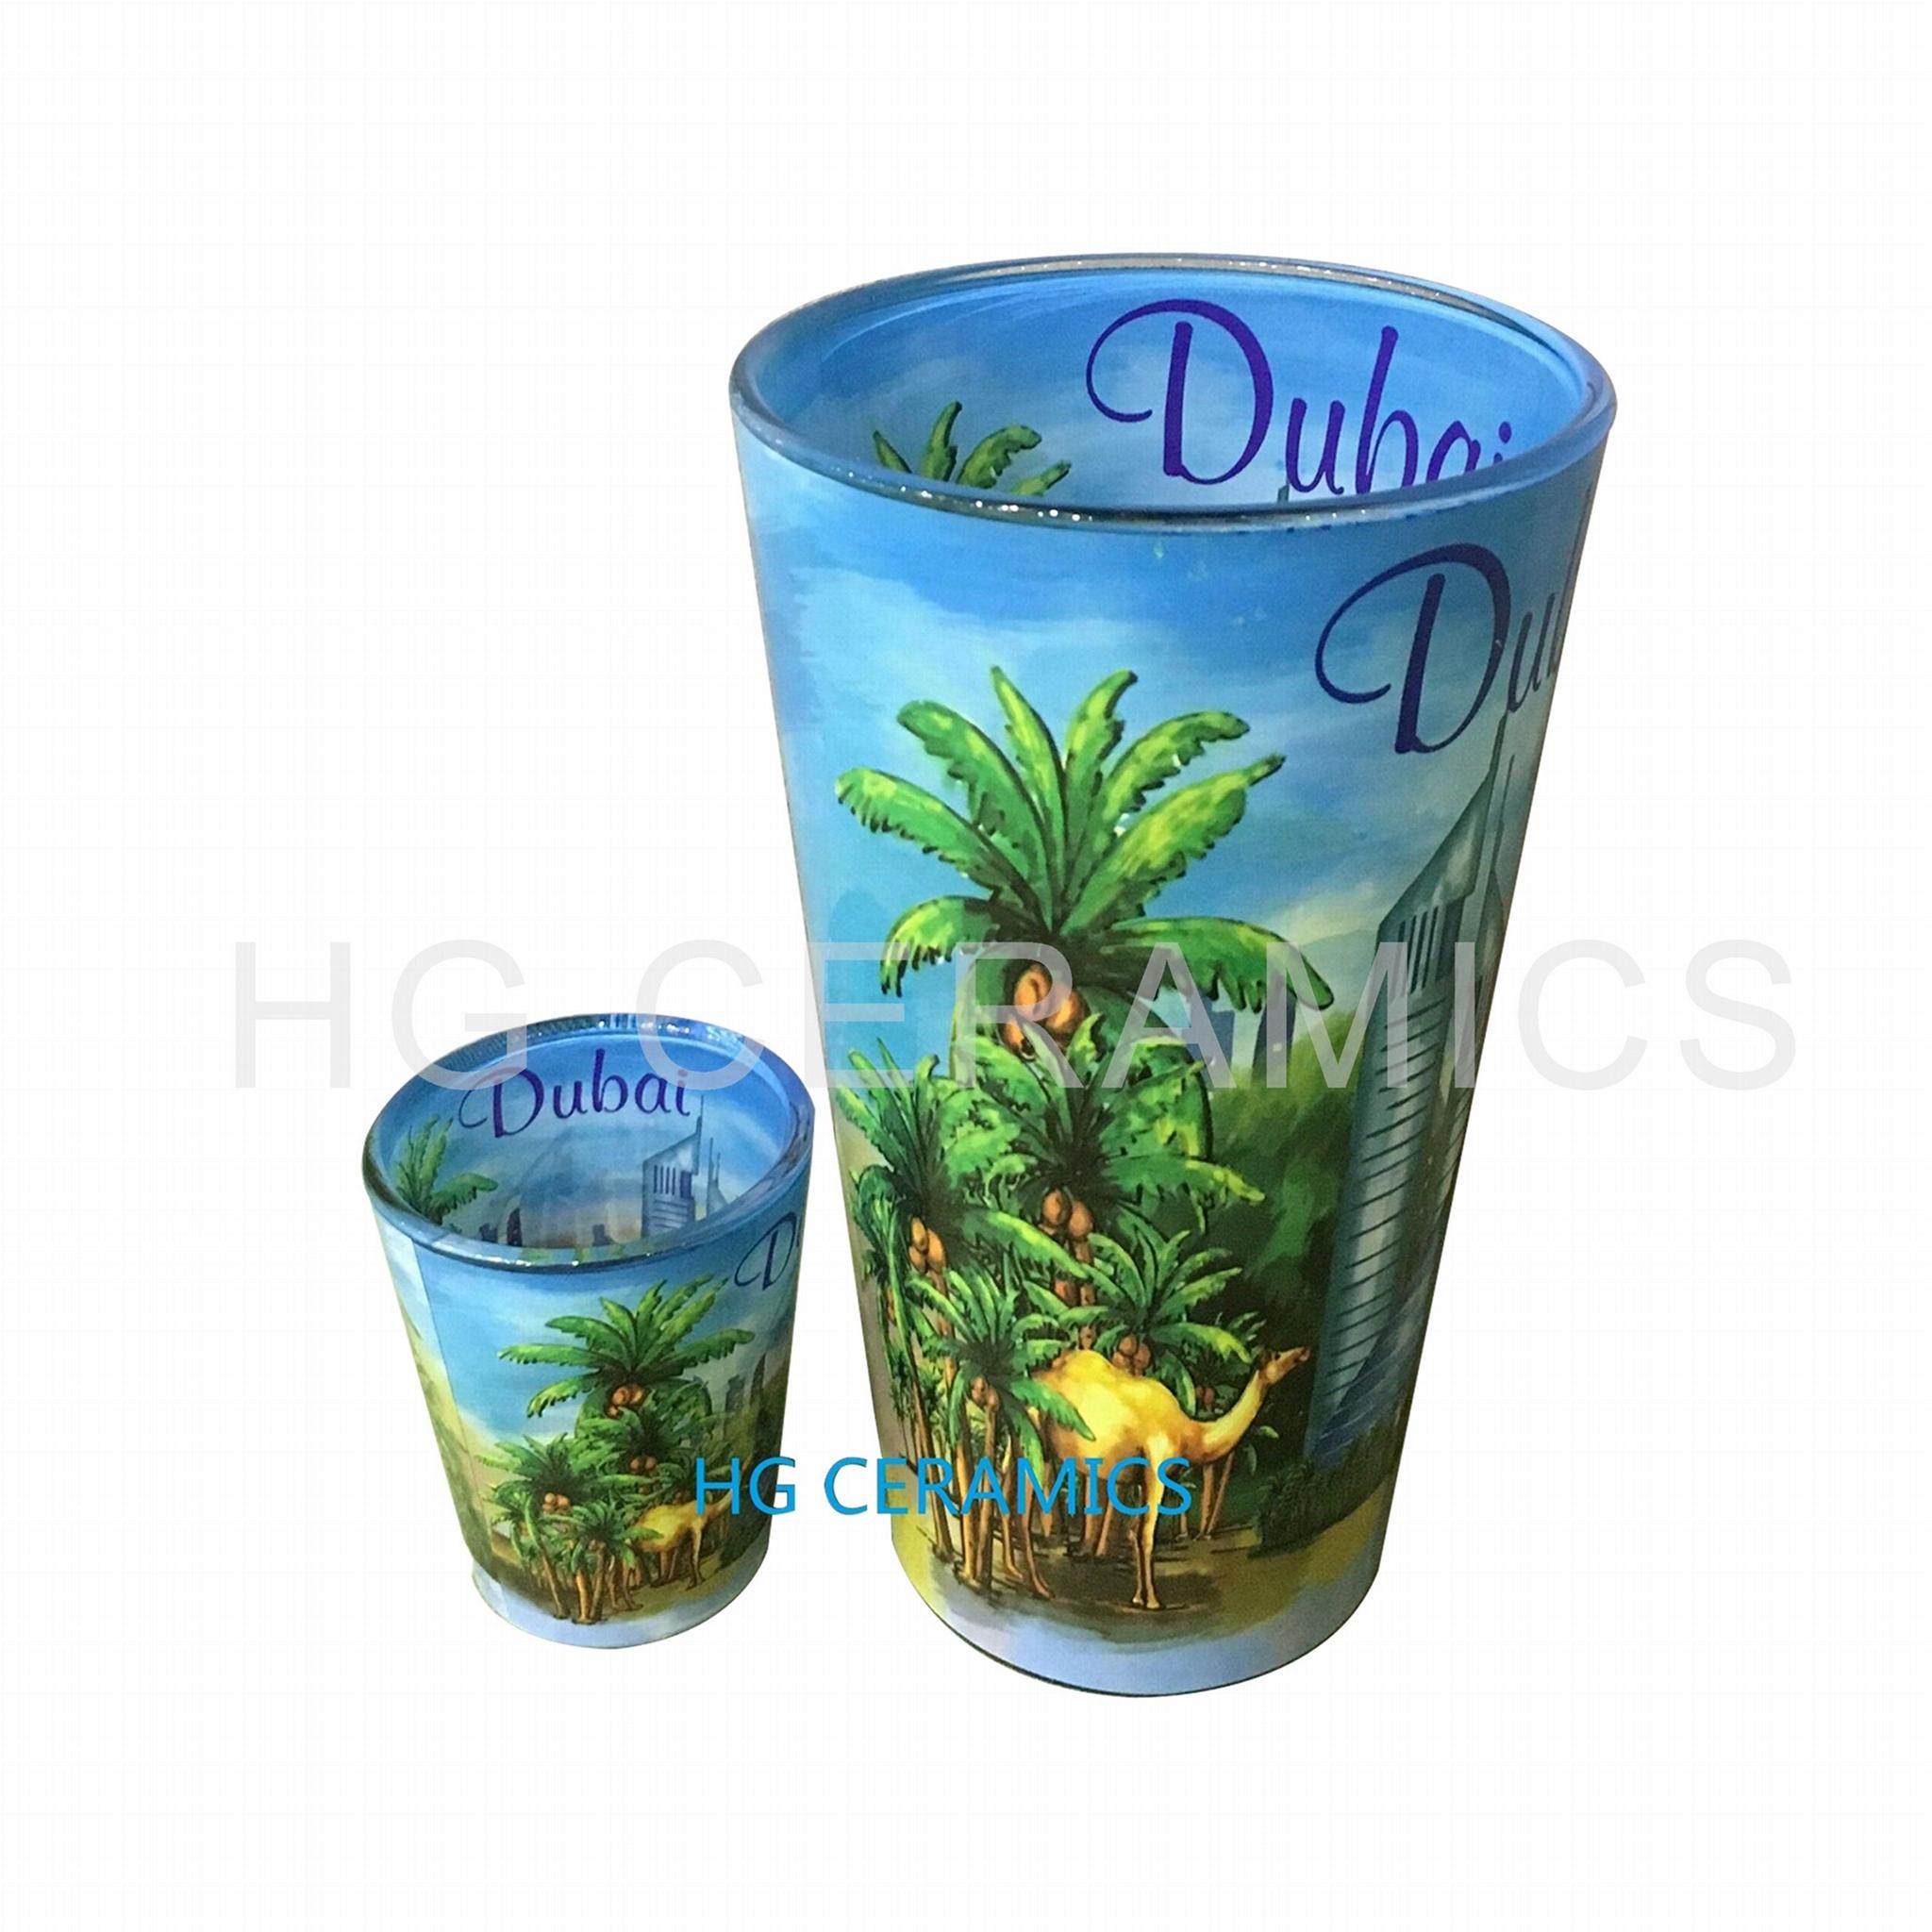 Doubal Side  Decal pint glass  1